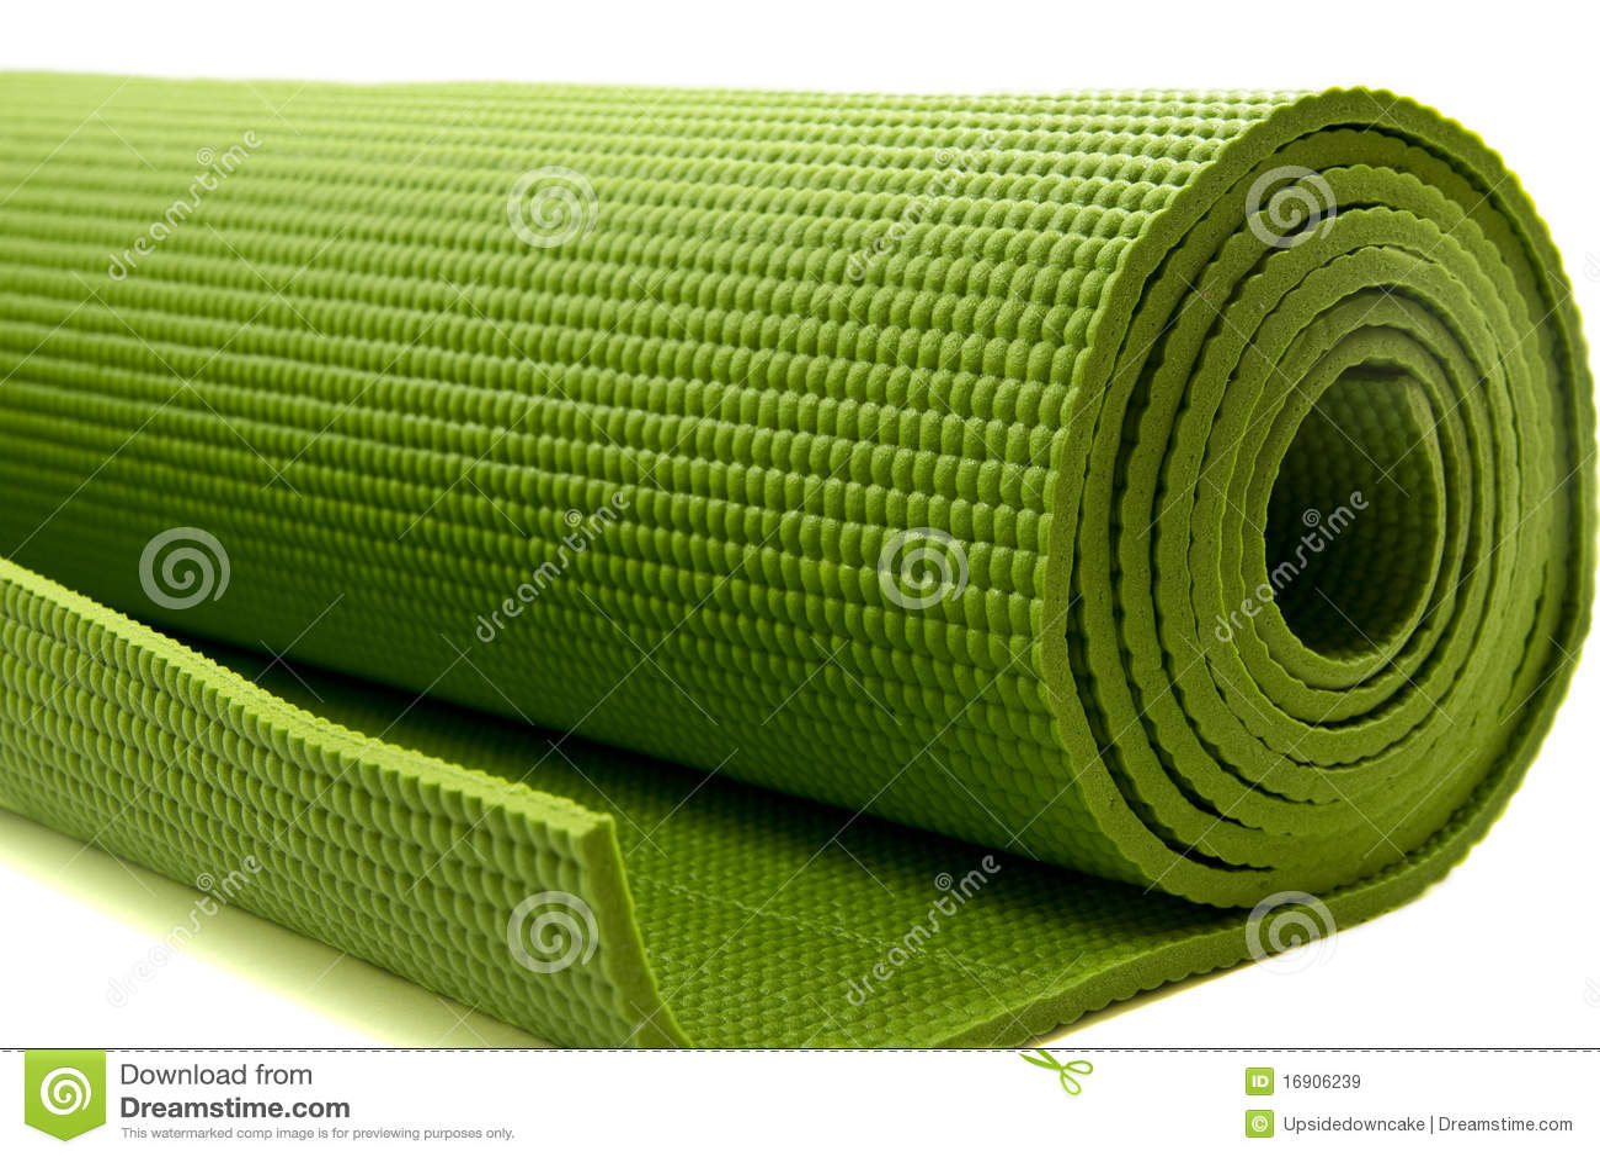 Yoga Mattress Royalty Free Stock Image